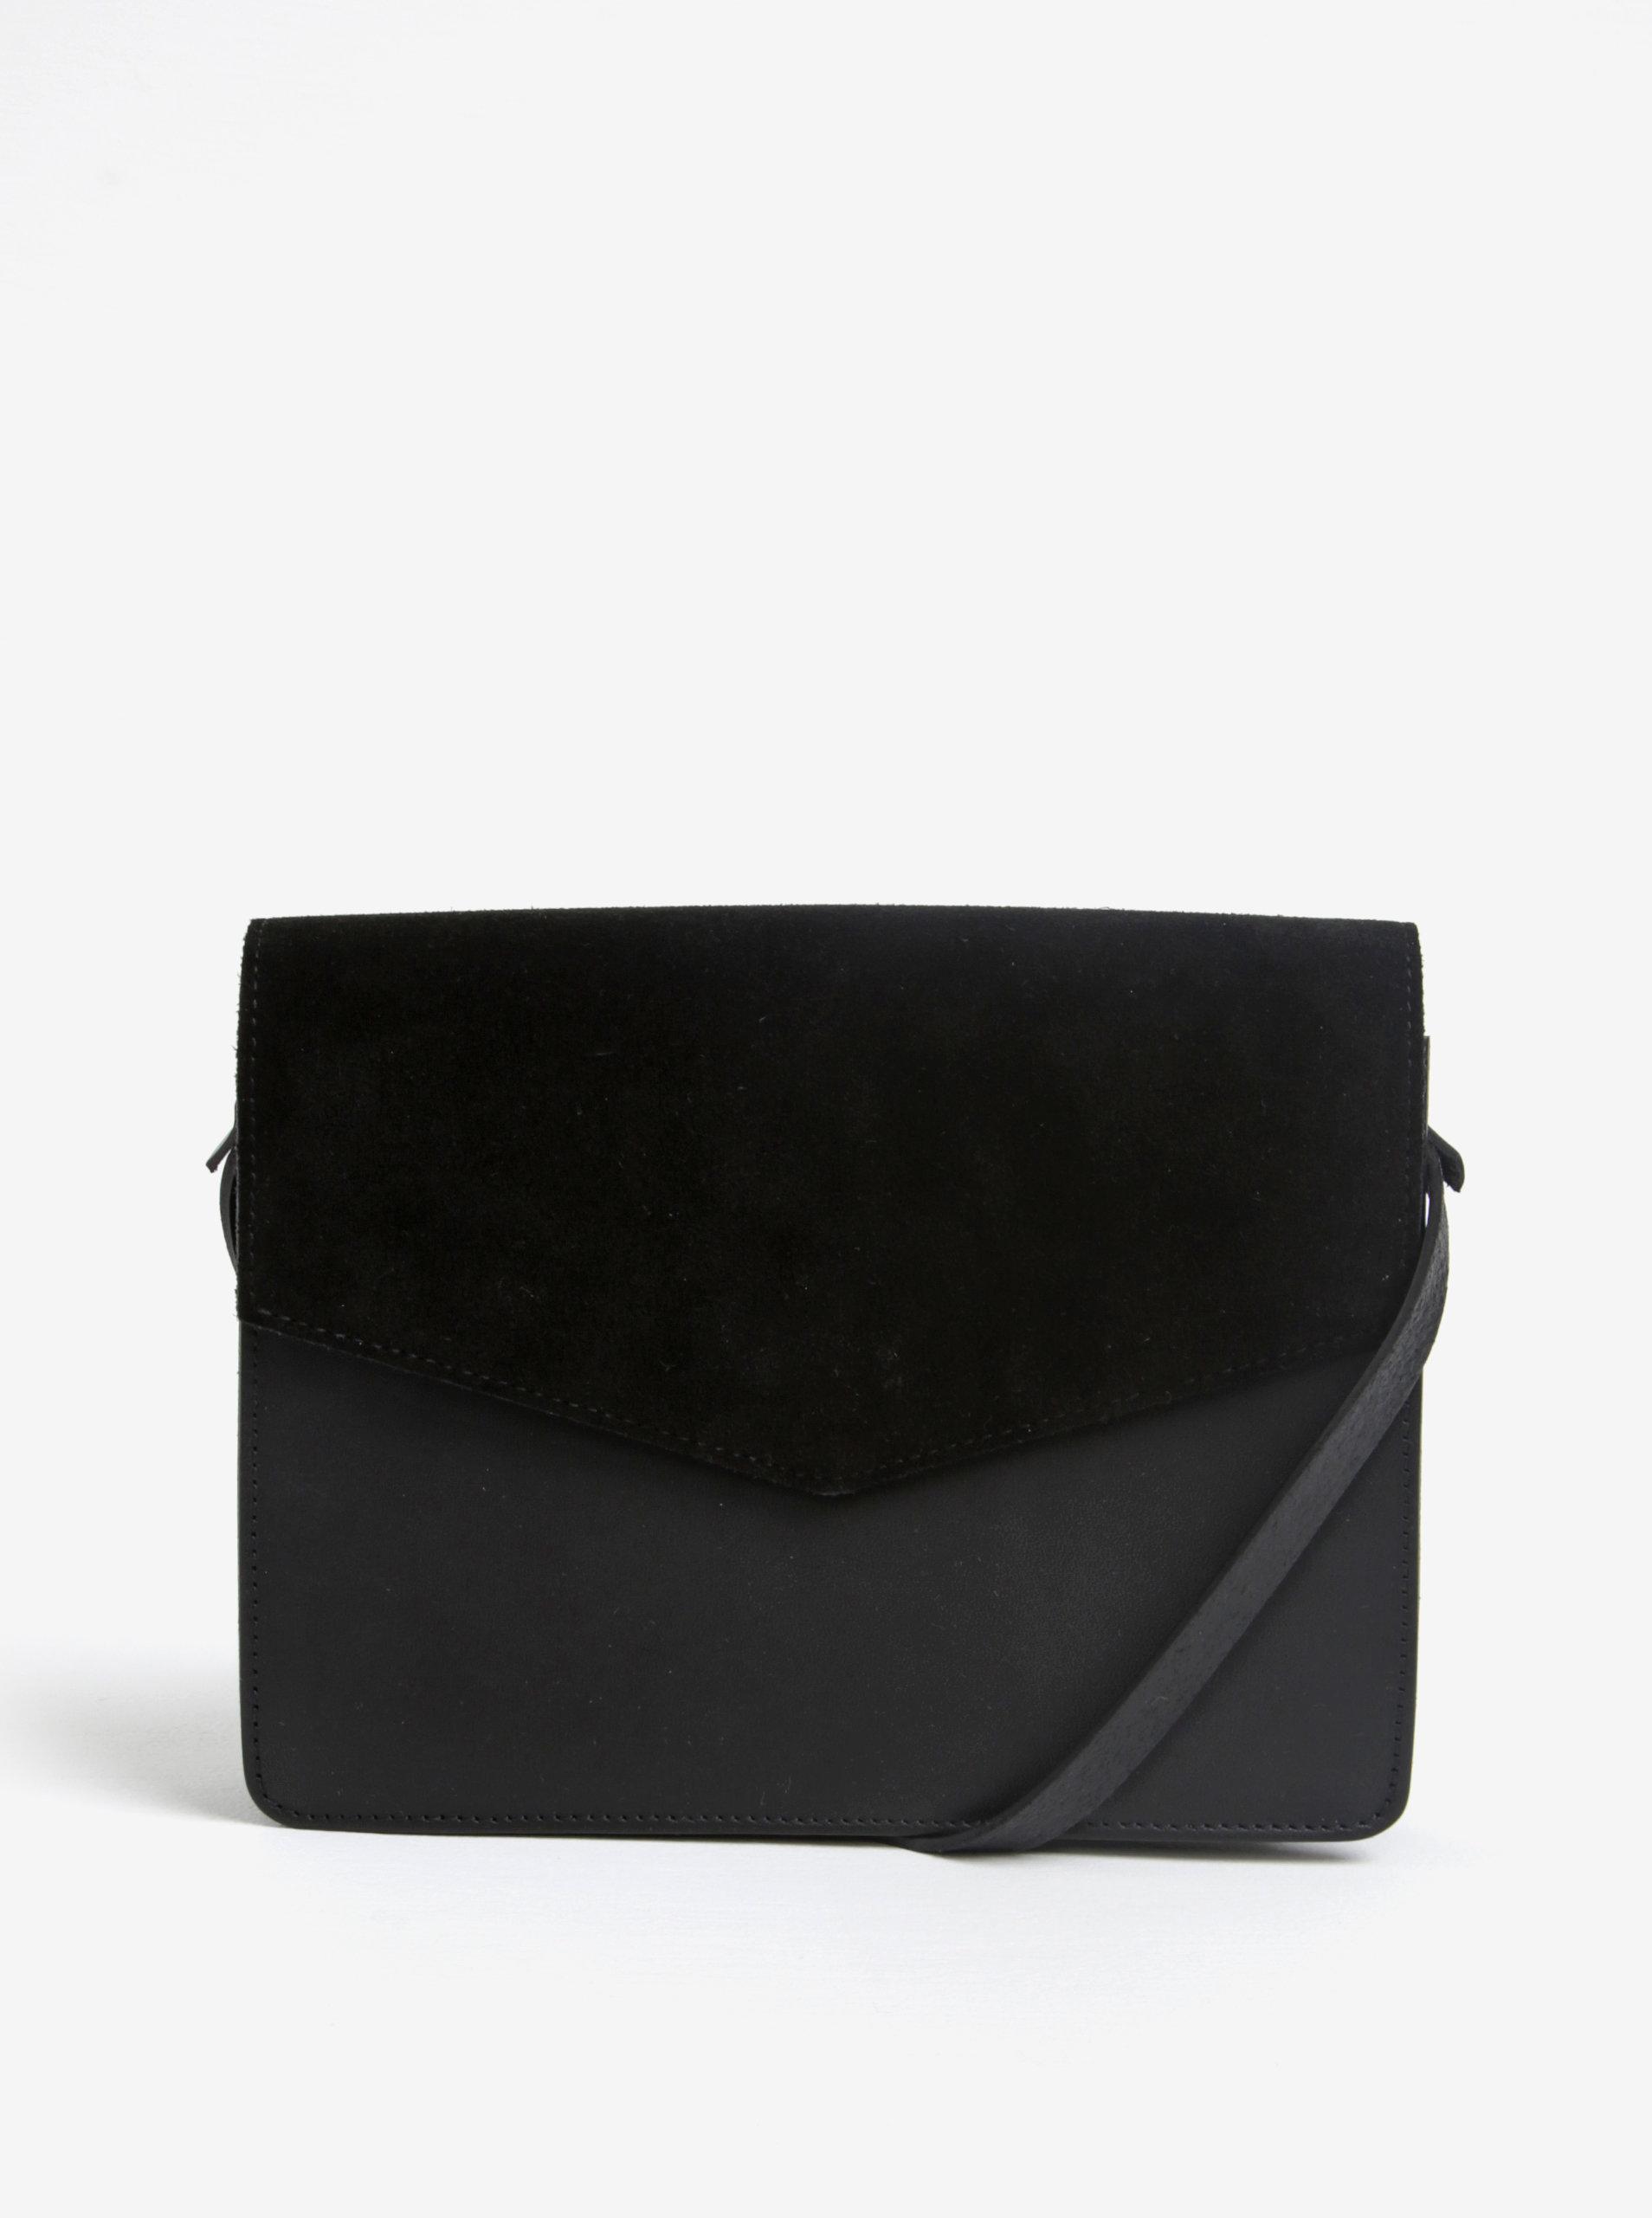 1e40e679b0d7 Černá kožená crossbody kabelka Pieces Dolly ...